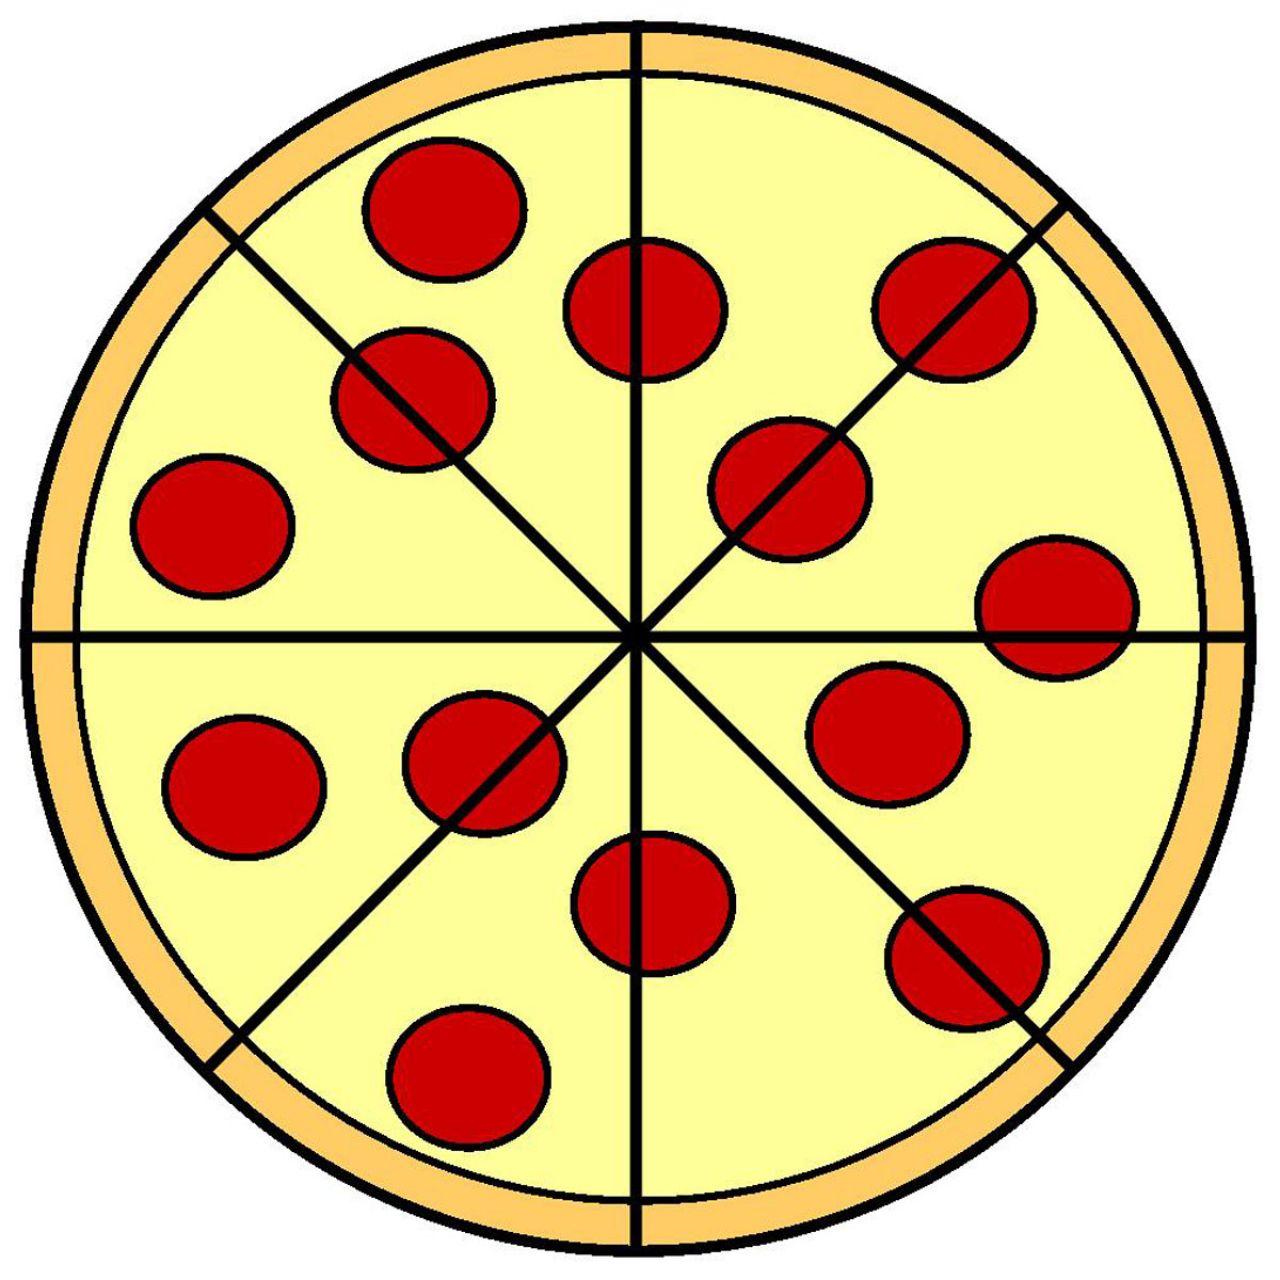 Half Circle Clipart | Free download best Half Circle Clipart